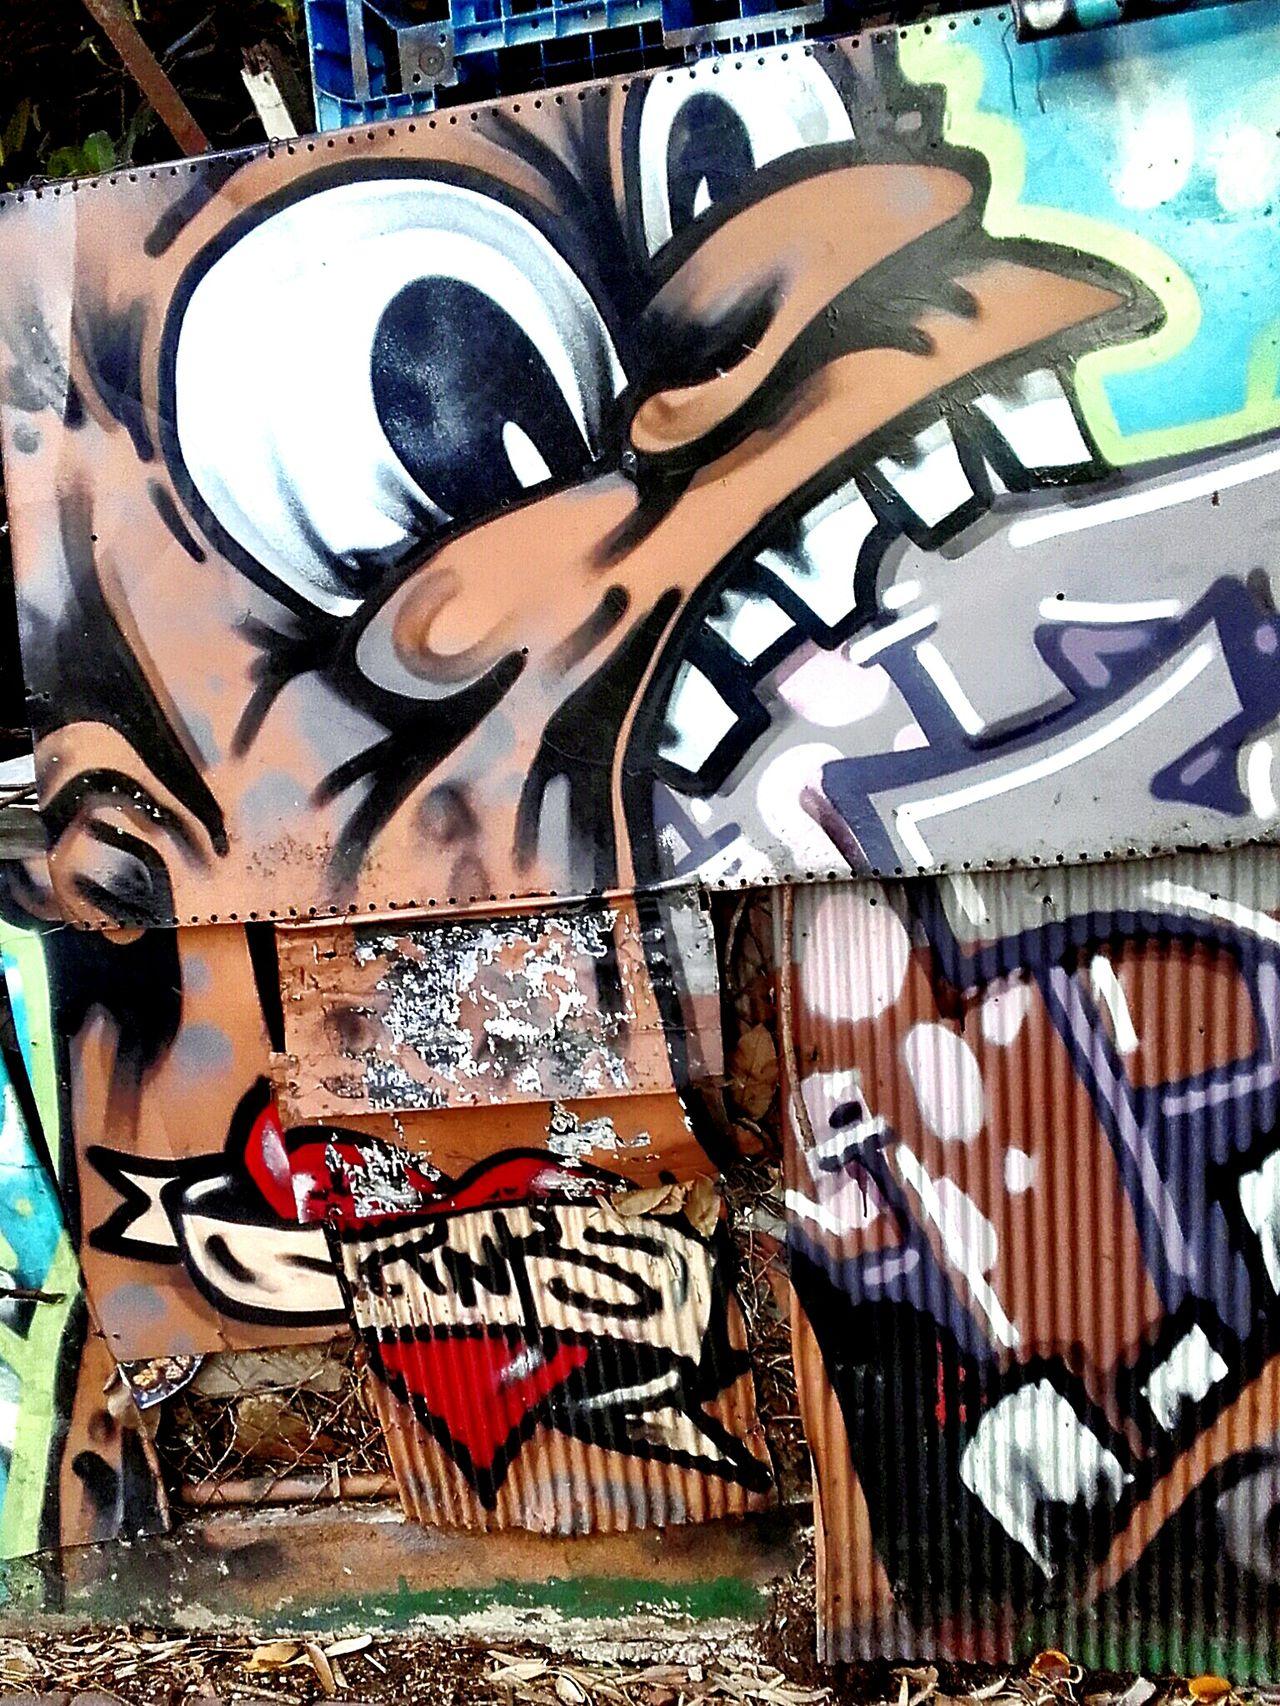 Streetart/graffiti Wall Art Tags Streetphotography Street Art Wallart Wallpainting Graff Street Photography Graffiti & Streetart Graffiti Art Graffiti Graffart Fenceart Fence Painting Tag Painted Fences Fencepainting FenceArtwork Bizarre Art Urban Art Graffitivandals UrbanART Graffiti Vandal Graffiti Vandals